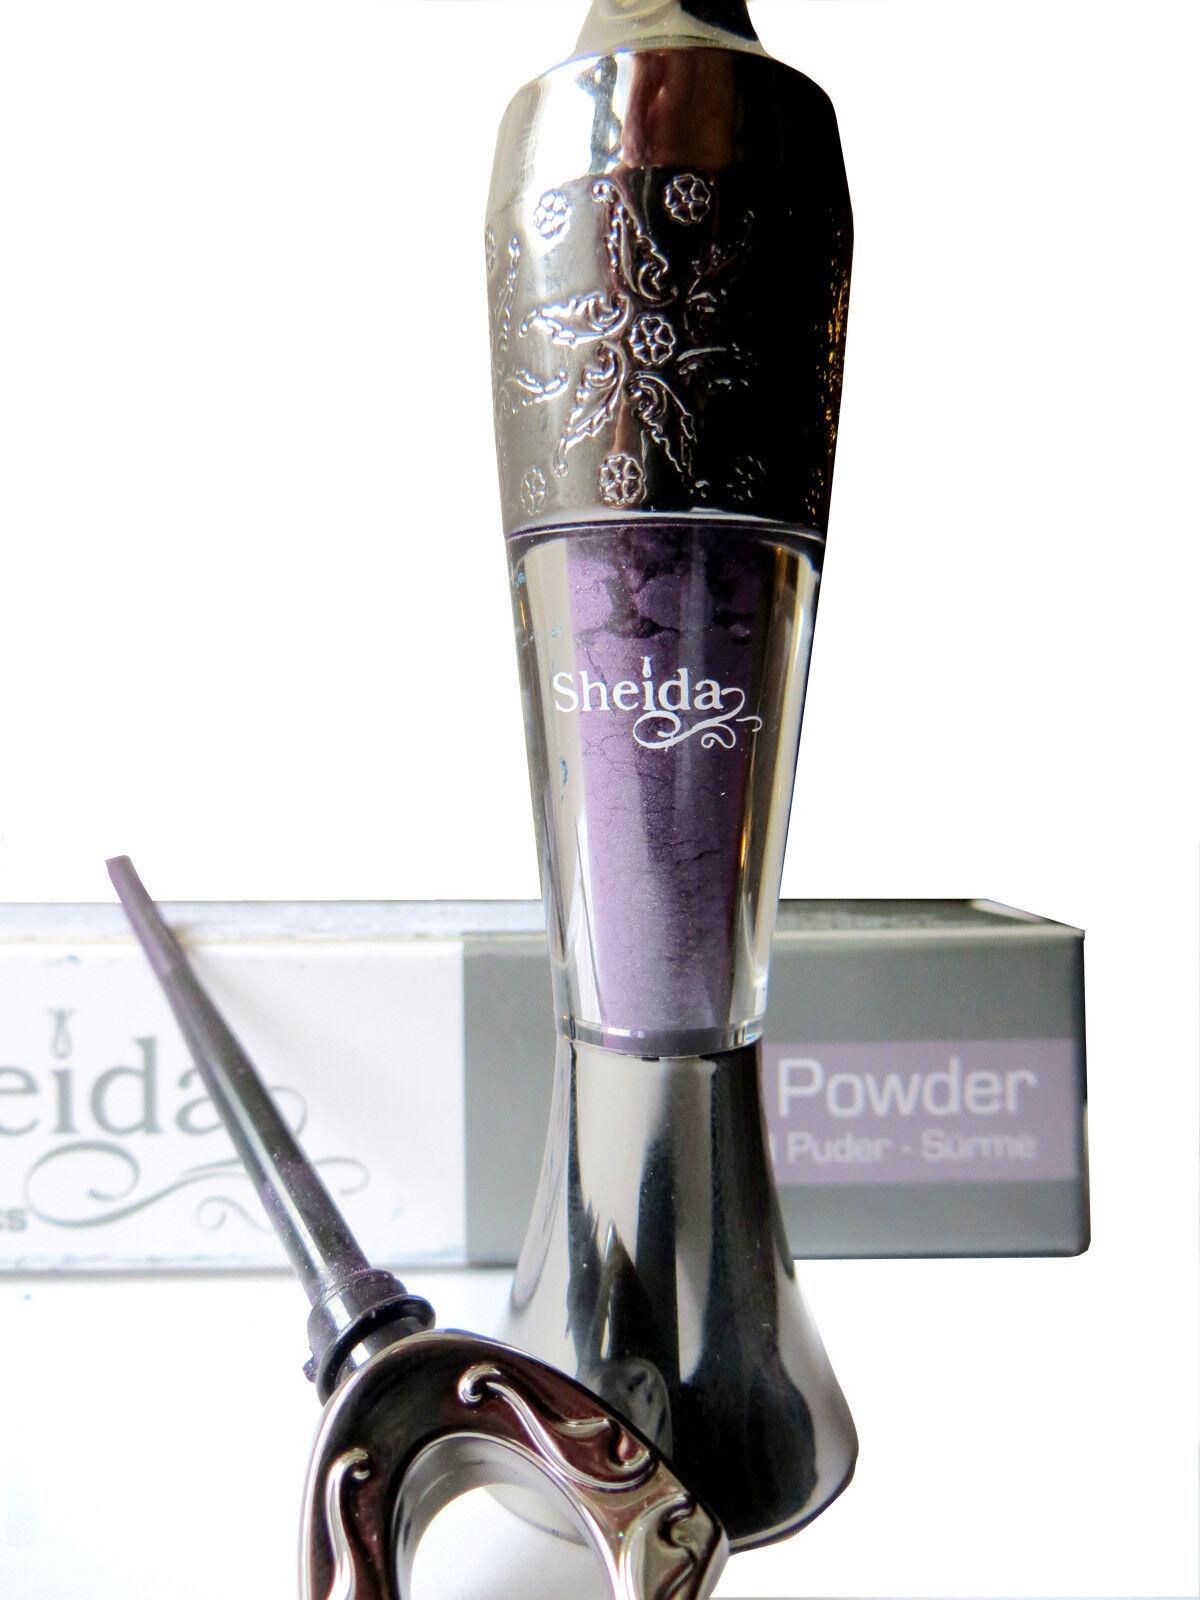 Sheida kohl kajal trucco polvere occhi si usa come matita, eyeliner, ombretto 2g